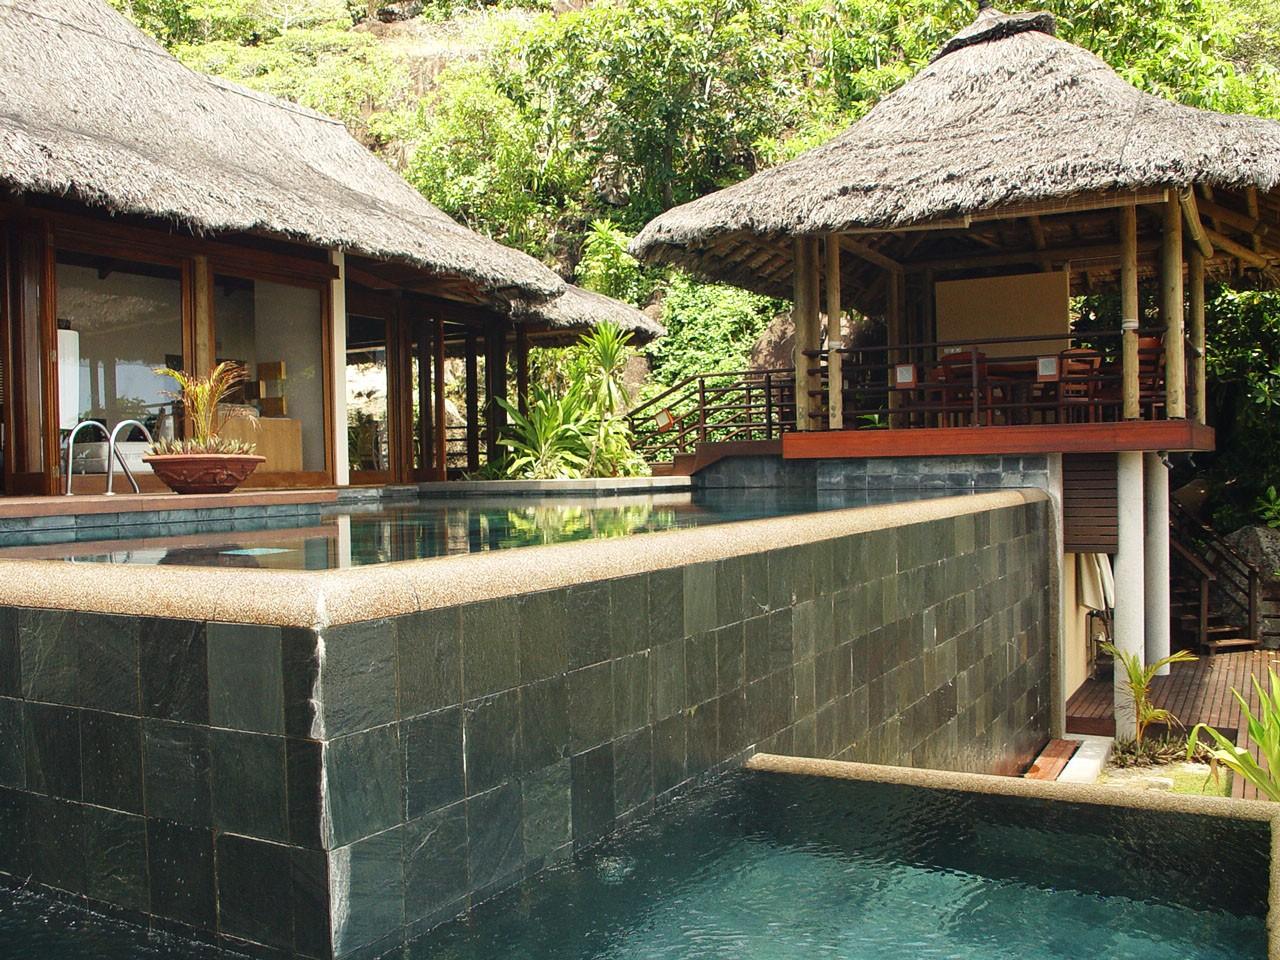 Swimming pool at Seychelles - استخر های شنا